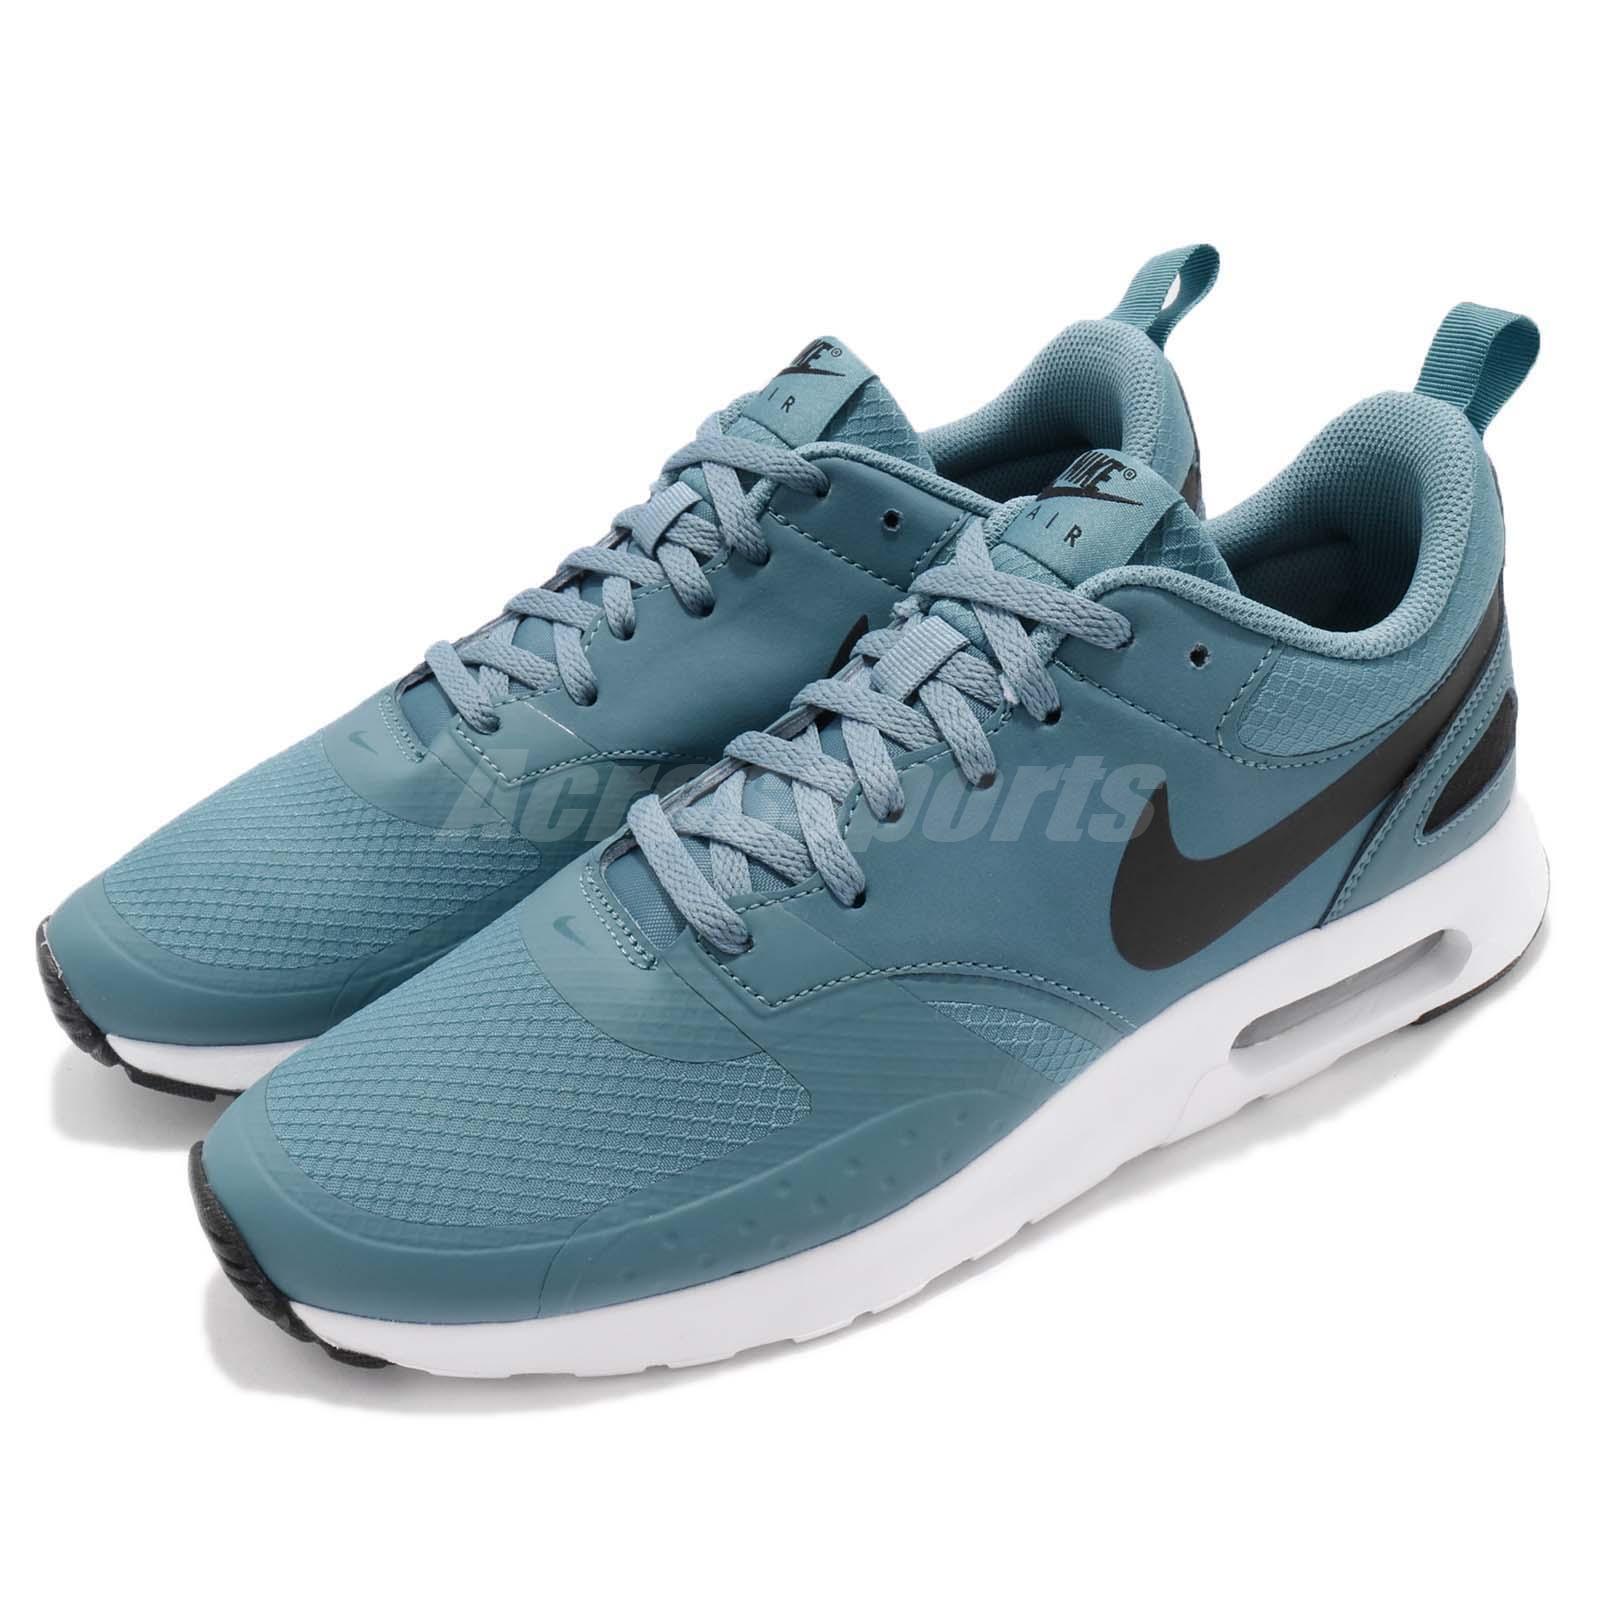 Nike Air Max Vision SE blueee Noise Aqua Black Men Running shoes 918231-402